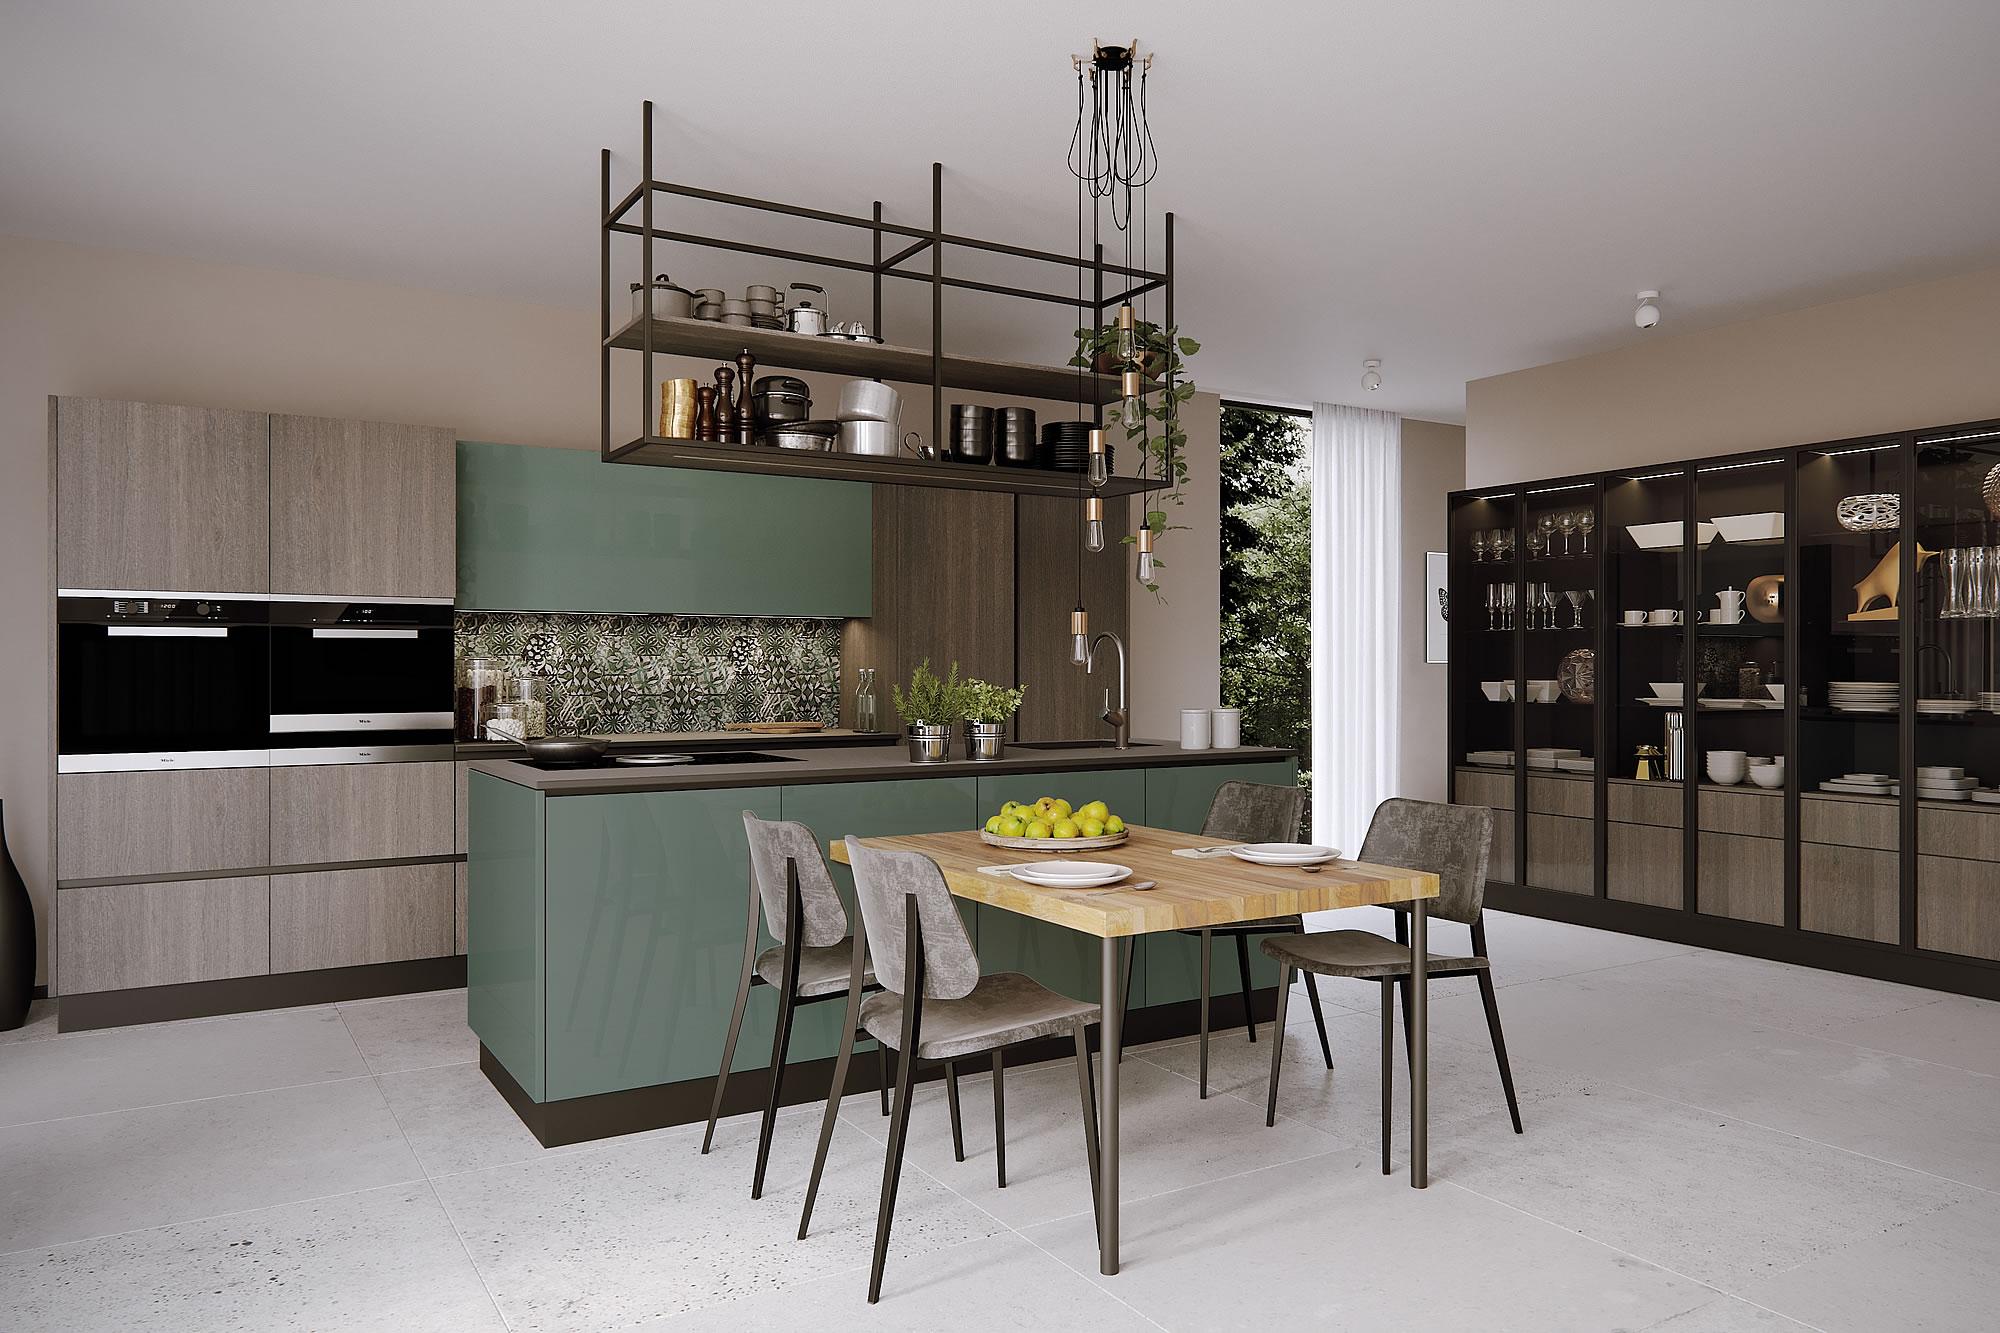 Cucine moderne design materico componibile for Cucine design